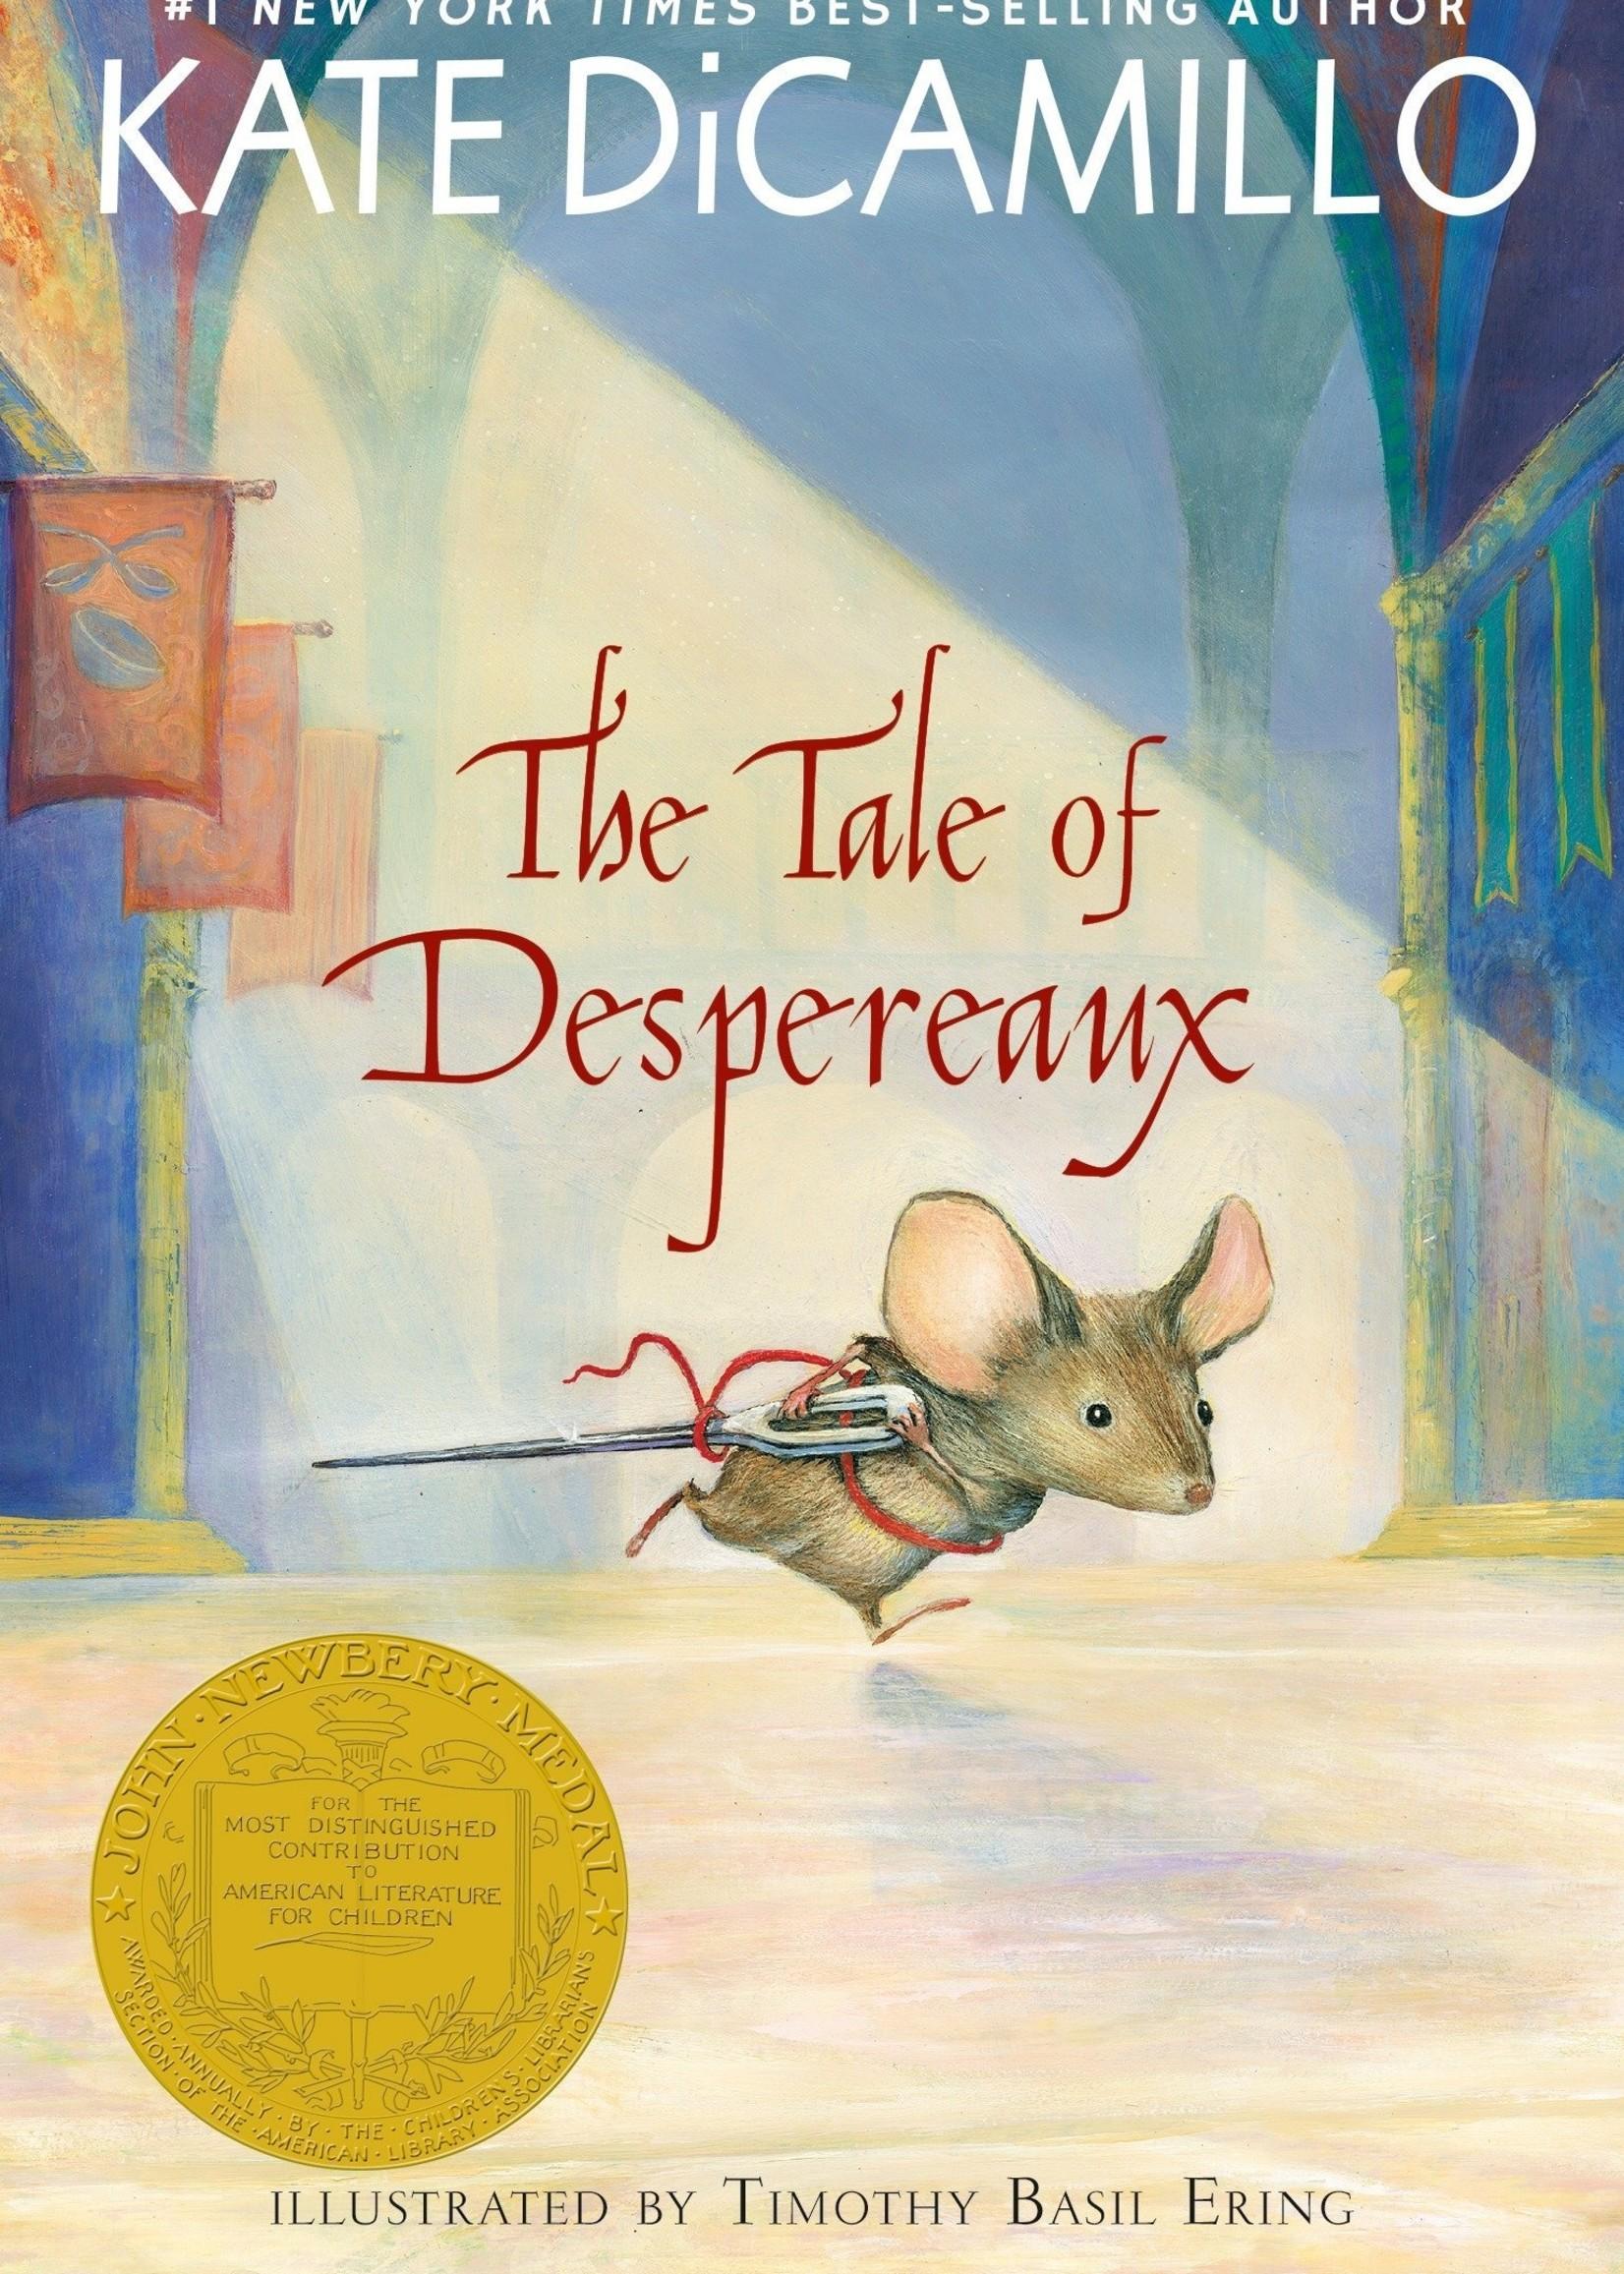 The Tale of Desperaux - Paperback